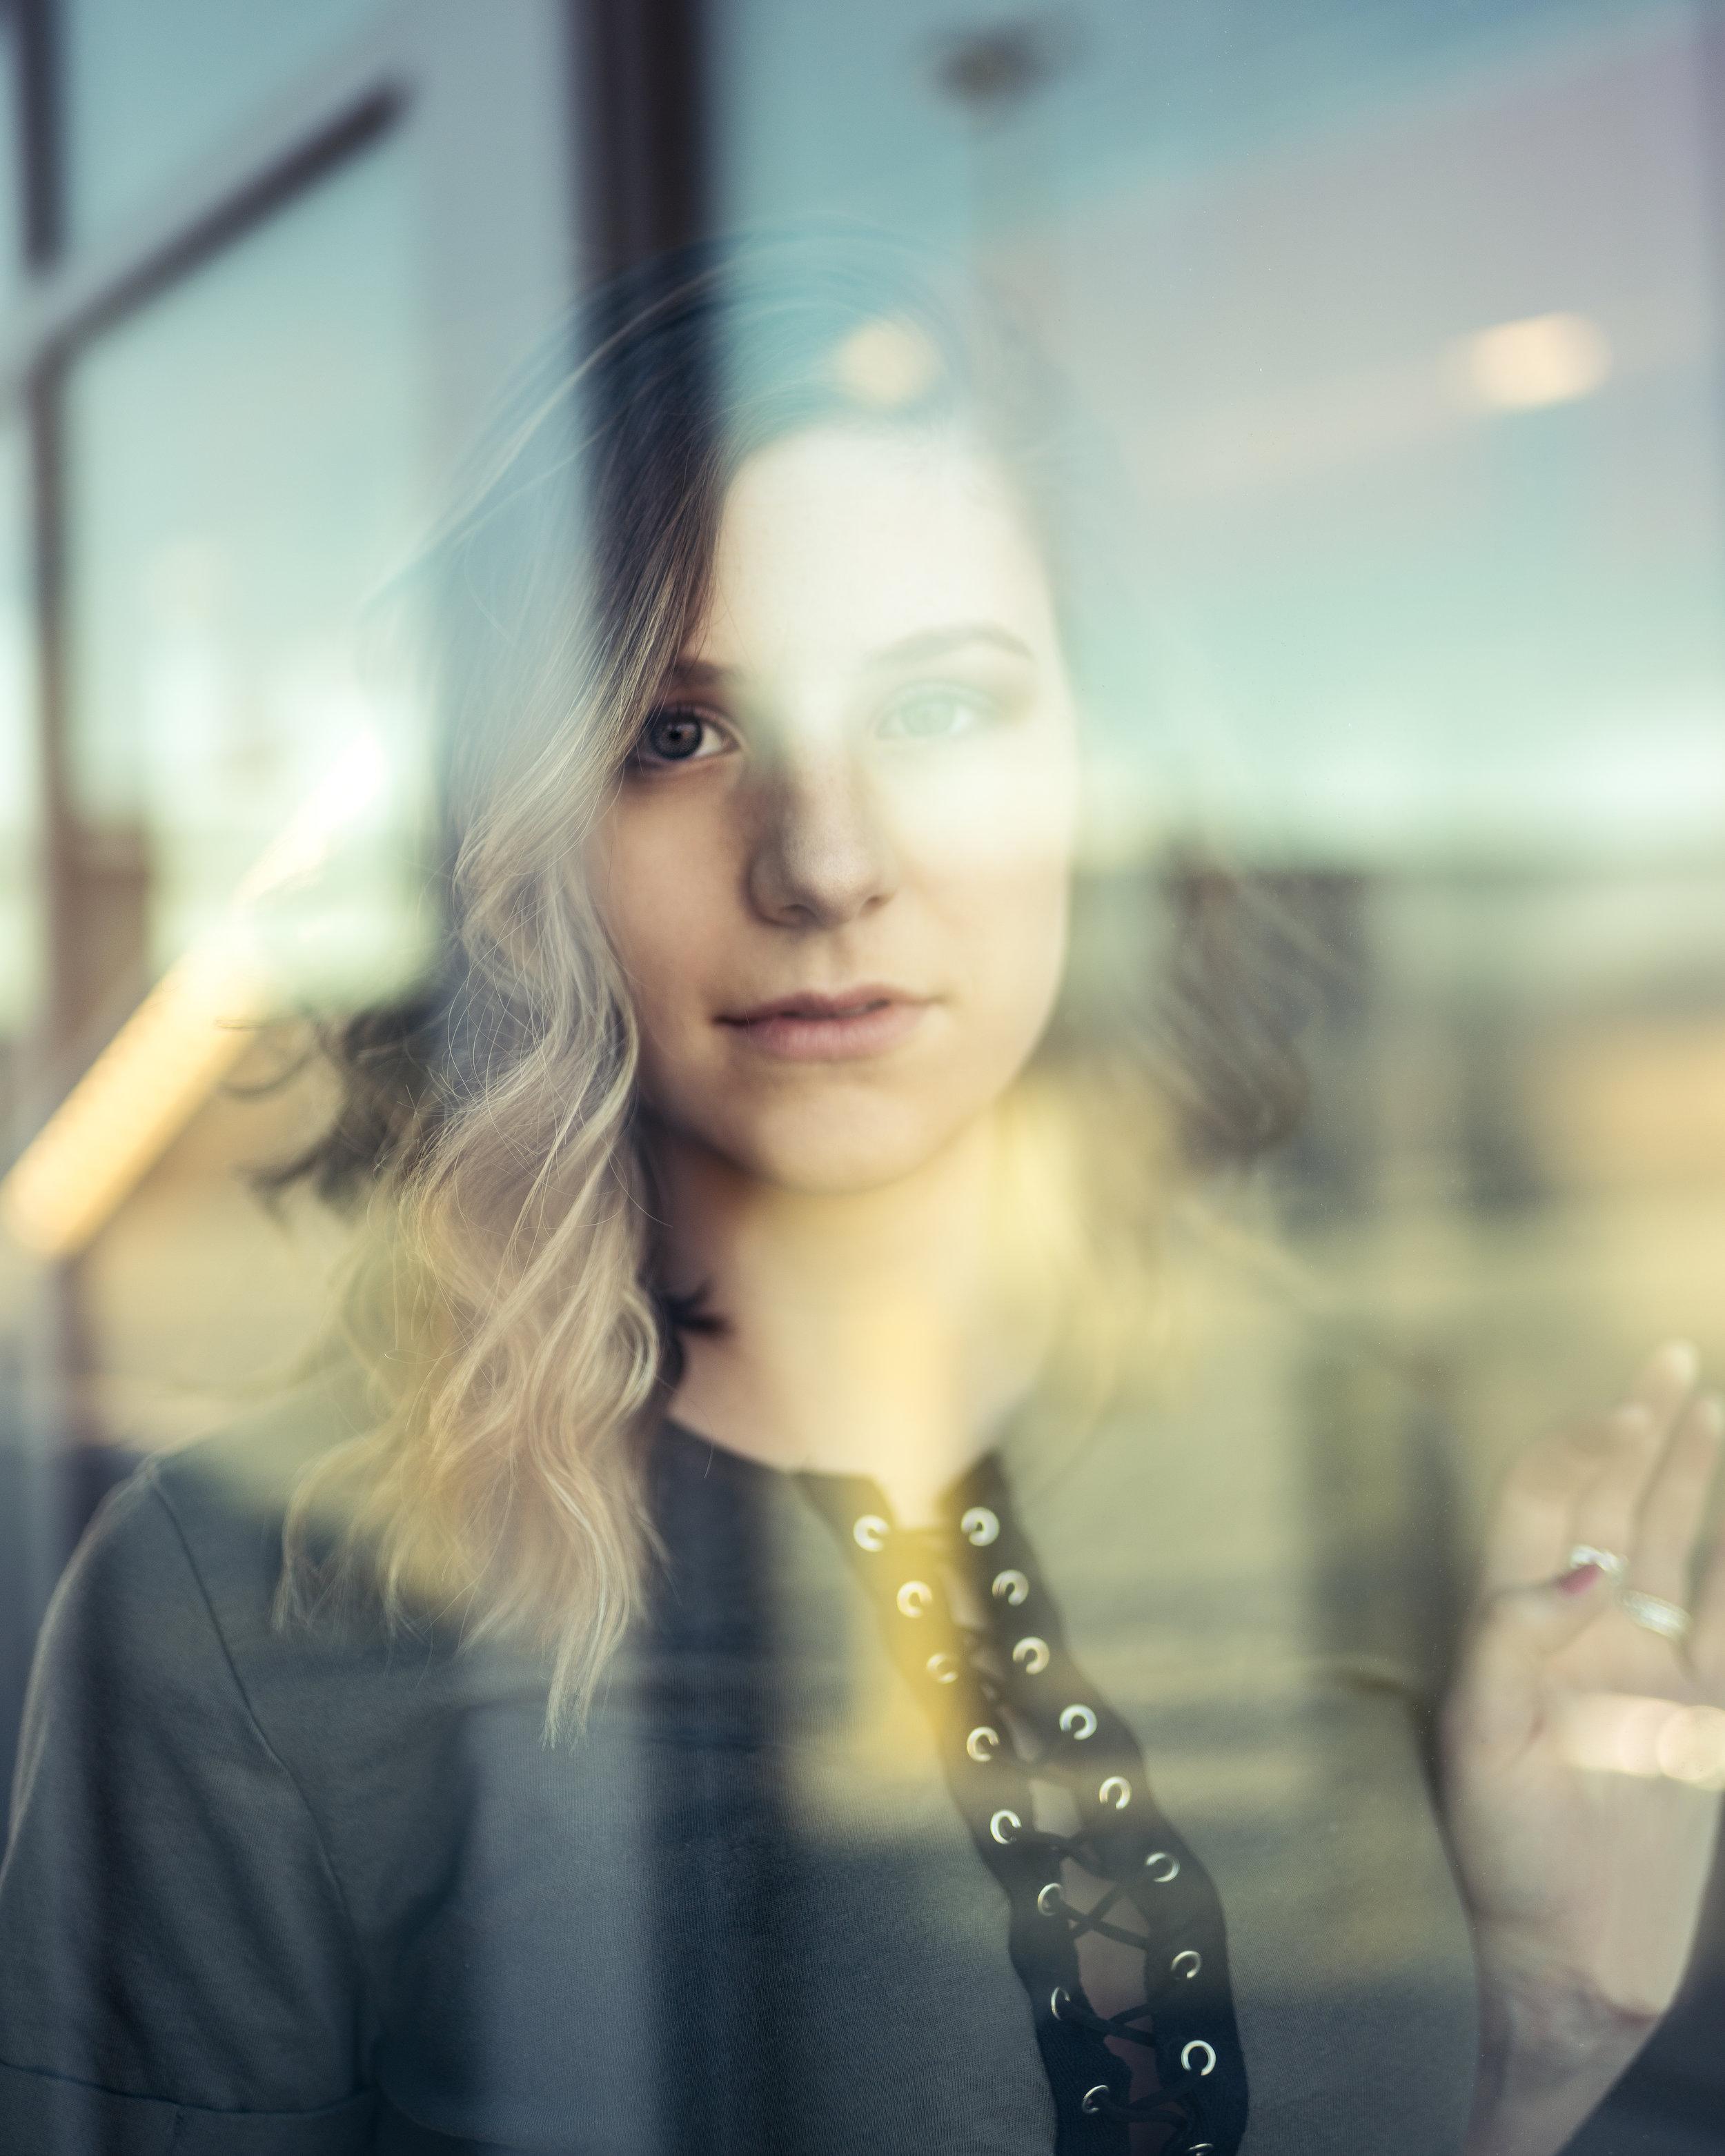 Natural Light Portraits - -----------------------------------